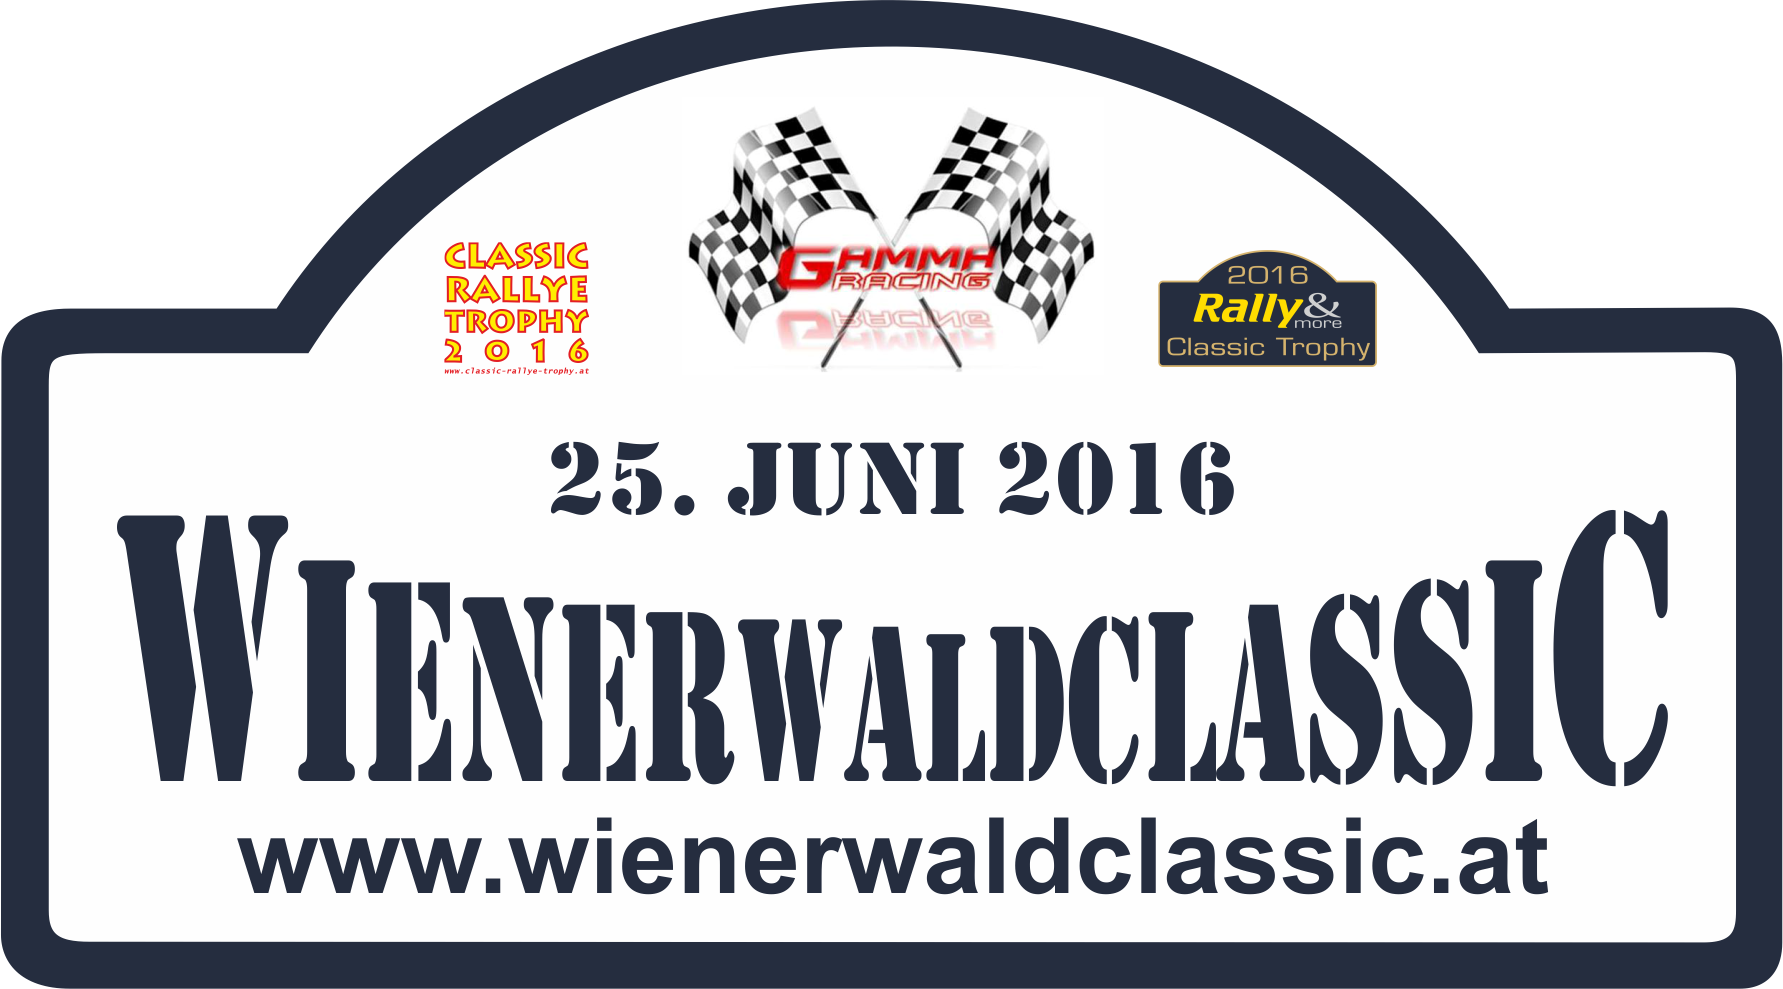 Wienerwaldclassic-2016 small